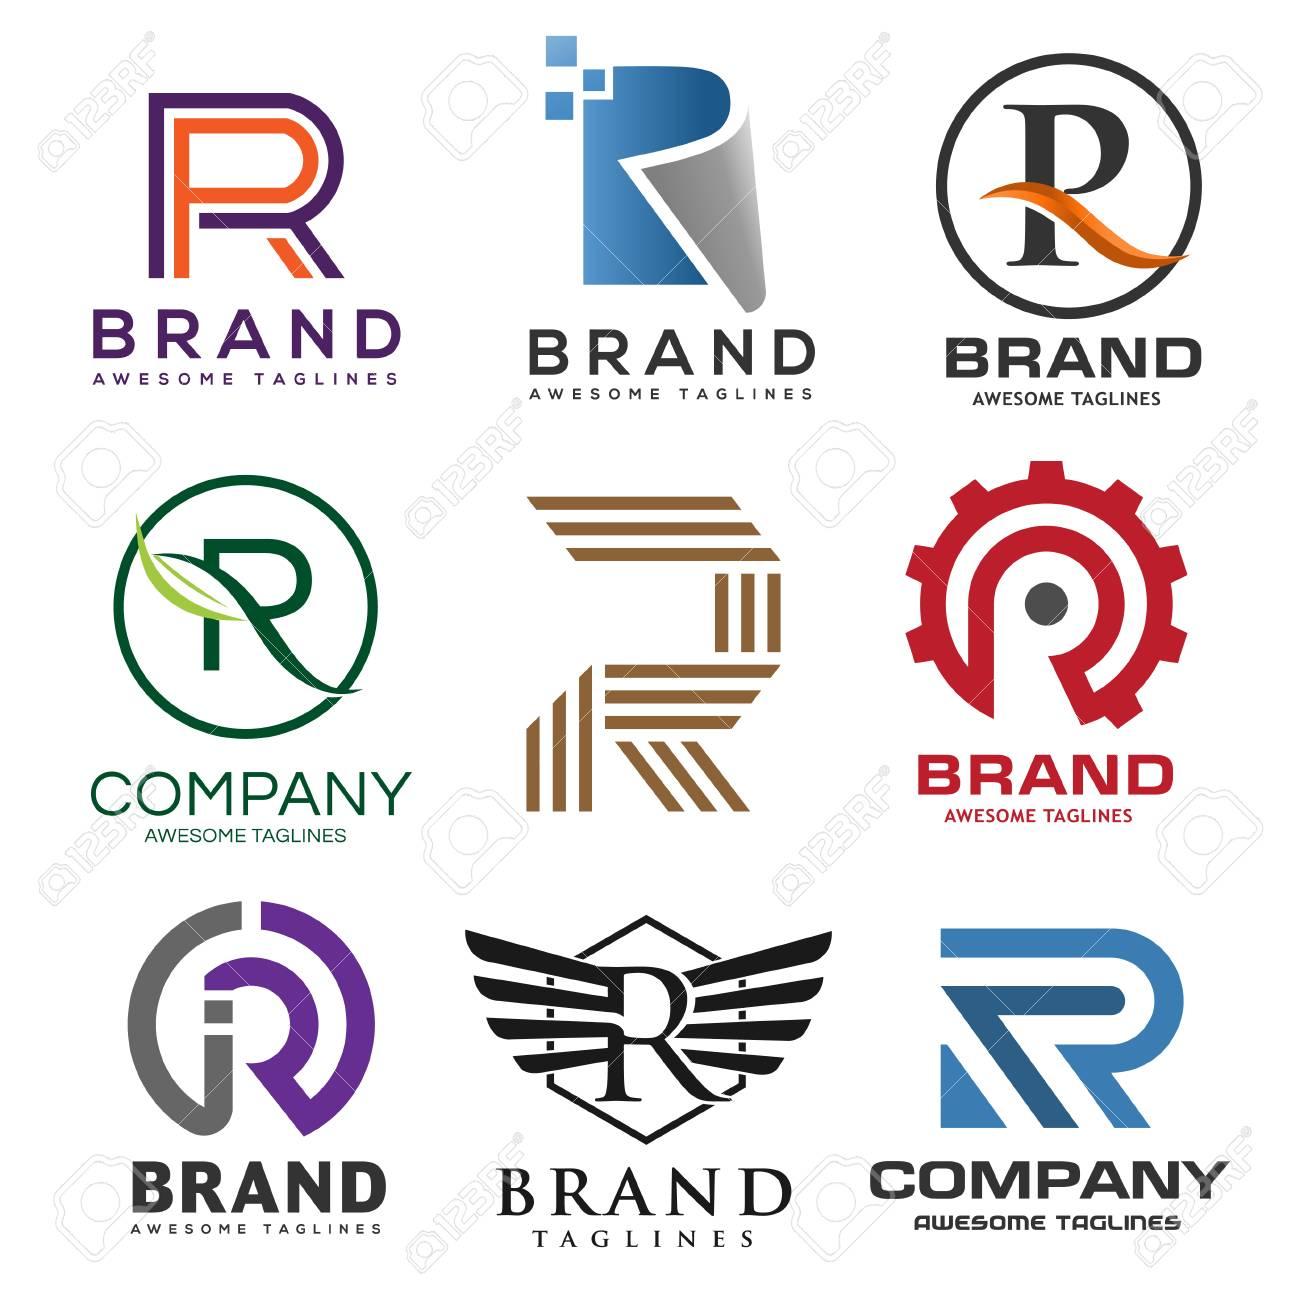 letter r logo template  creative letter R logo, best letter R logo design set, Abstract..